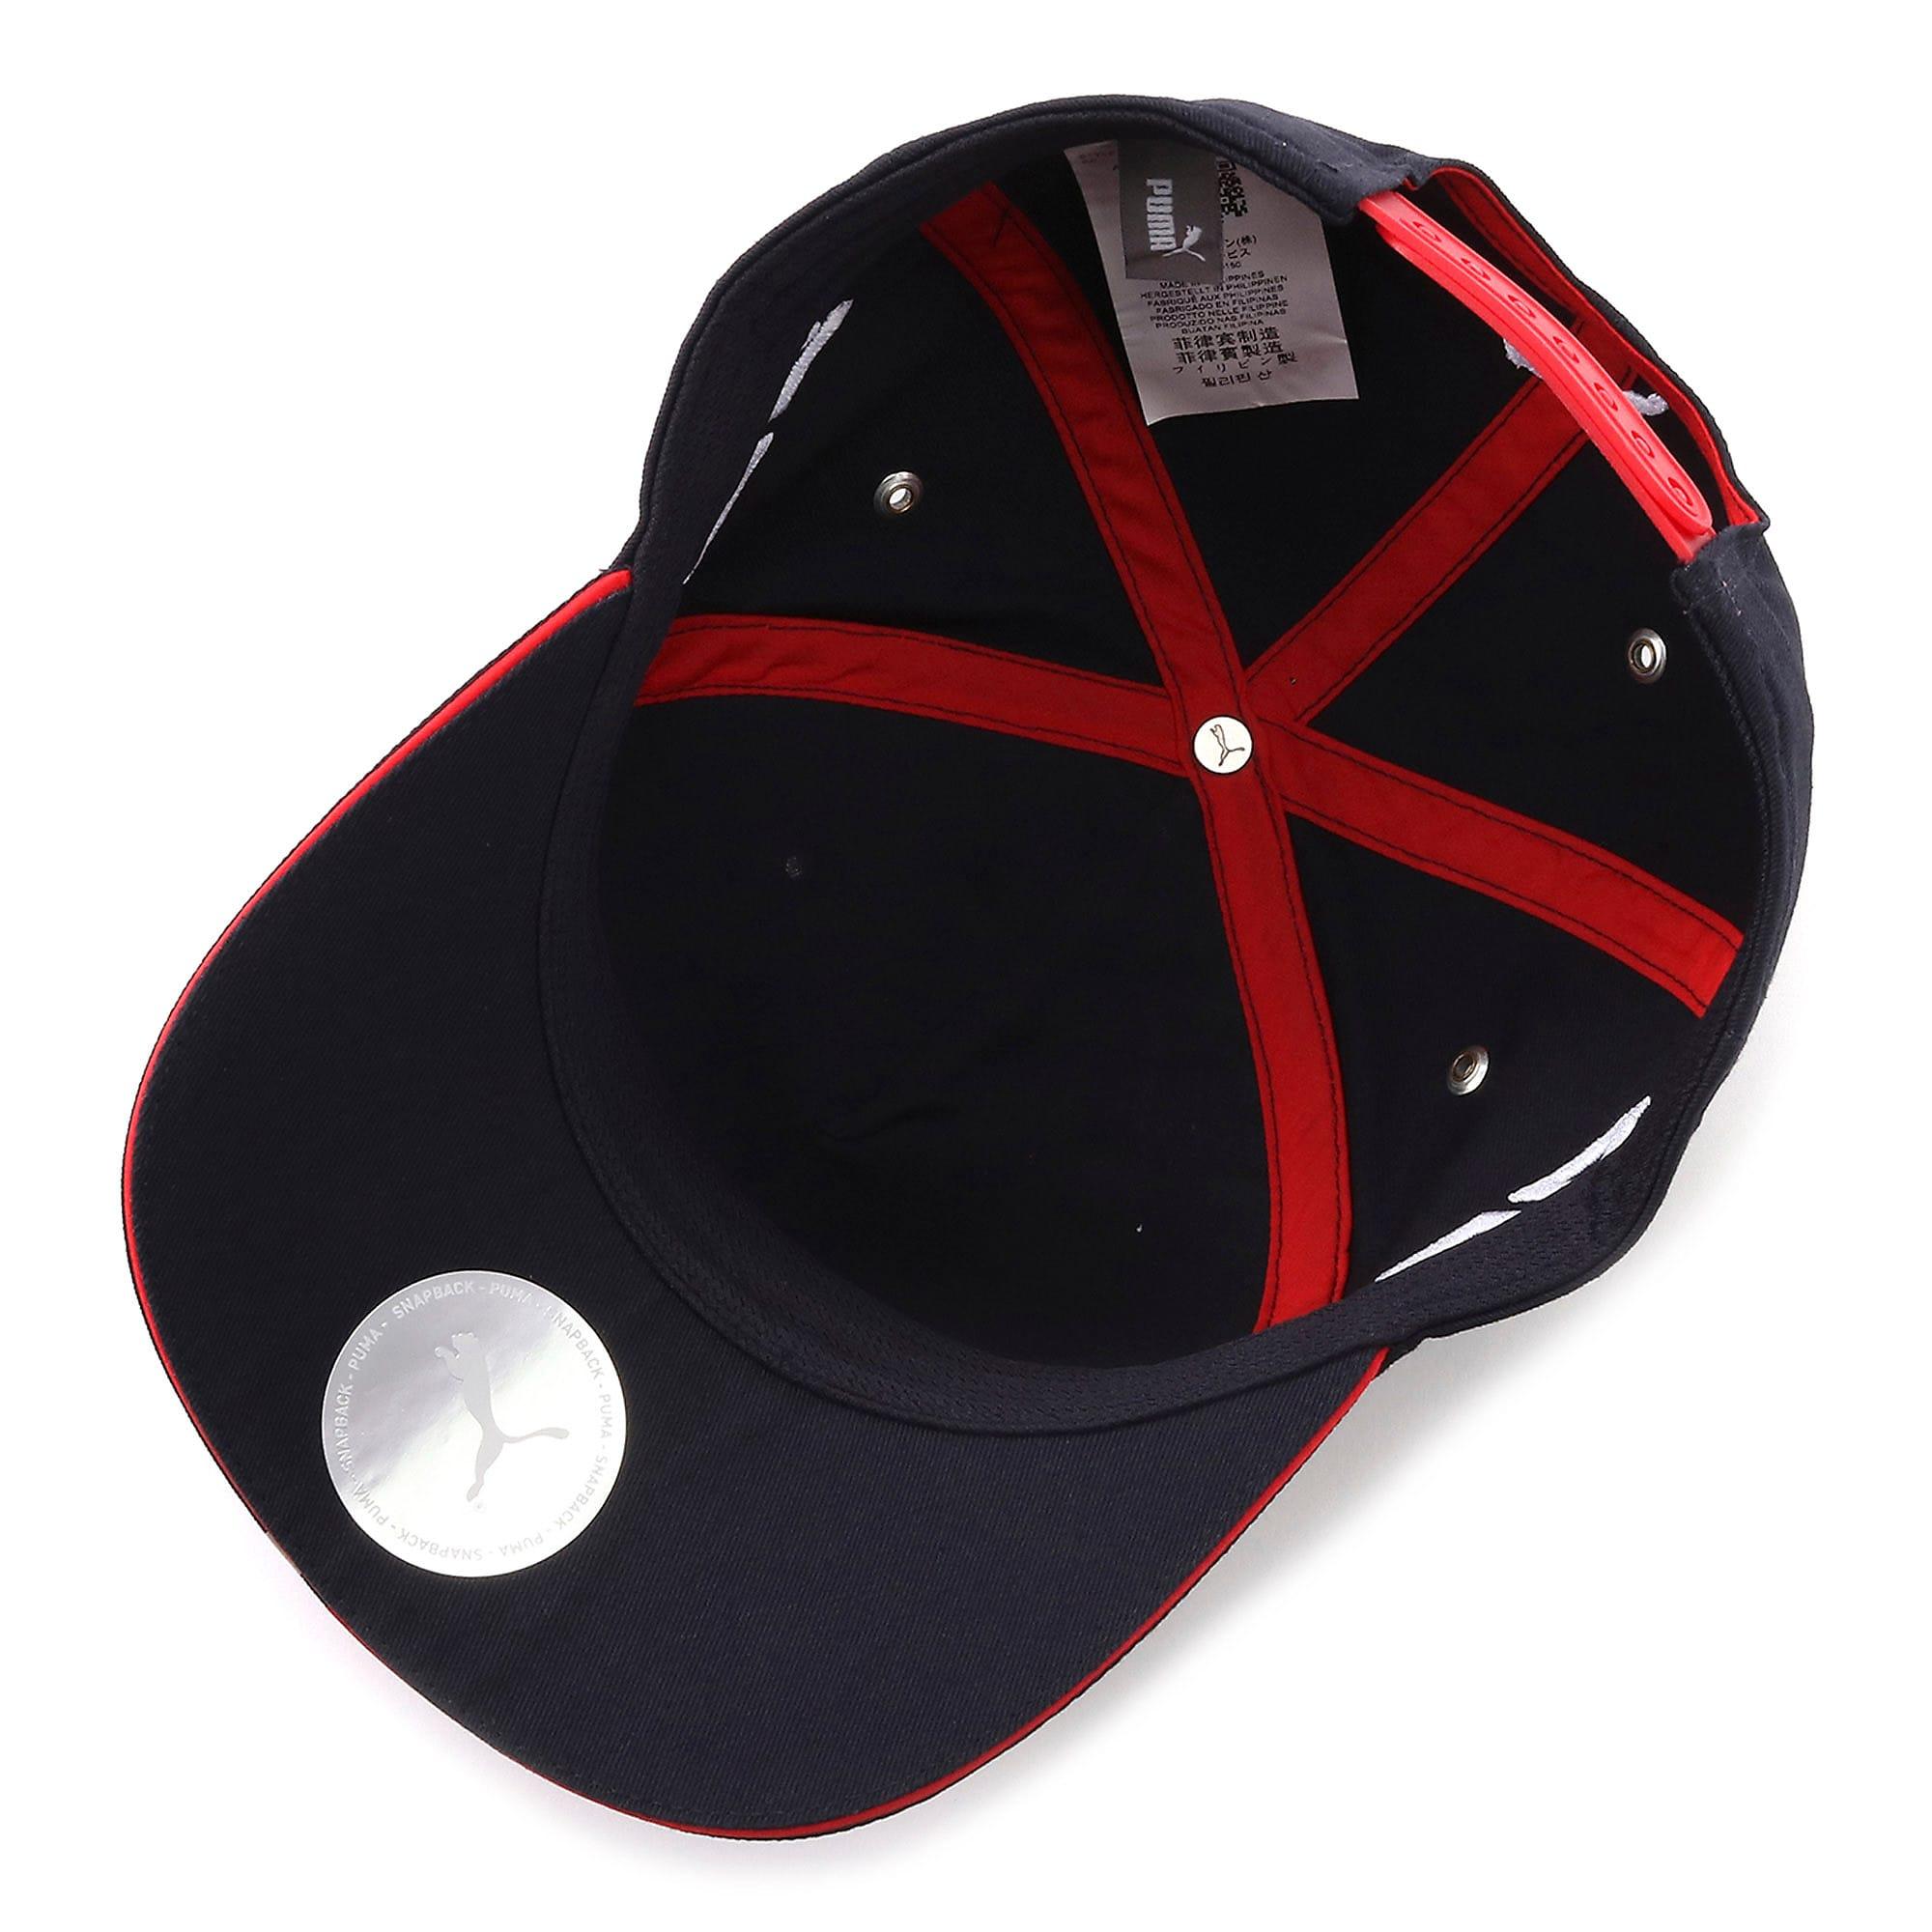 Thumbnail 8 of ASTON MARTIN RED BULL RACING レプリカ ガスリー FB キャップ, NIGHT SKY-Chinese Red, medium-JPN